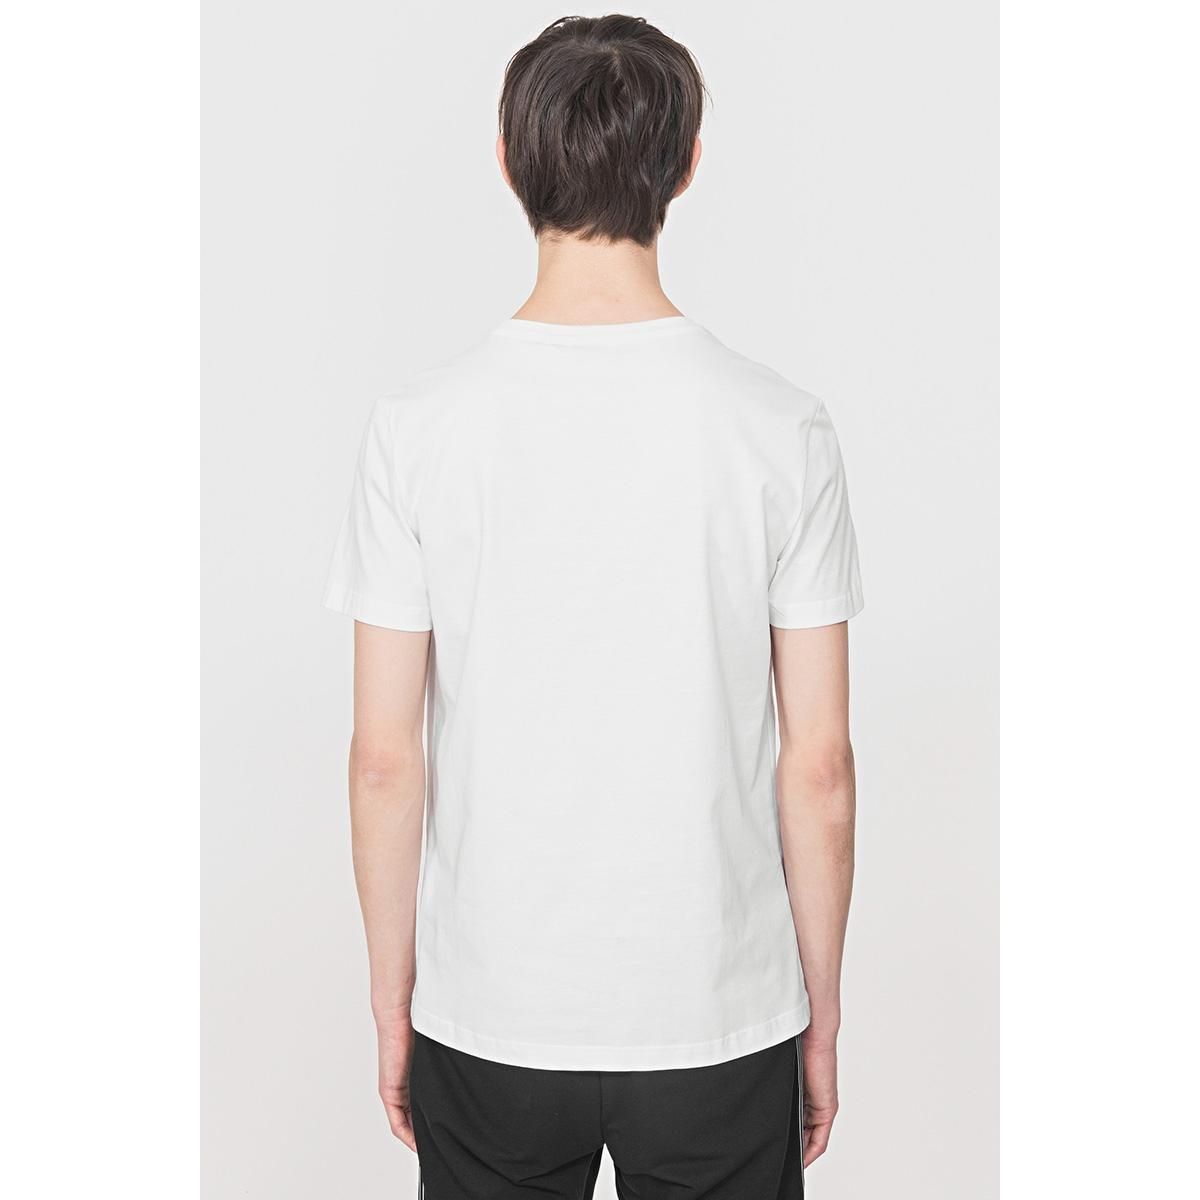 t shirt with print mmks01816 antony morato t-shirt 1000 white